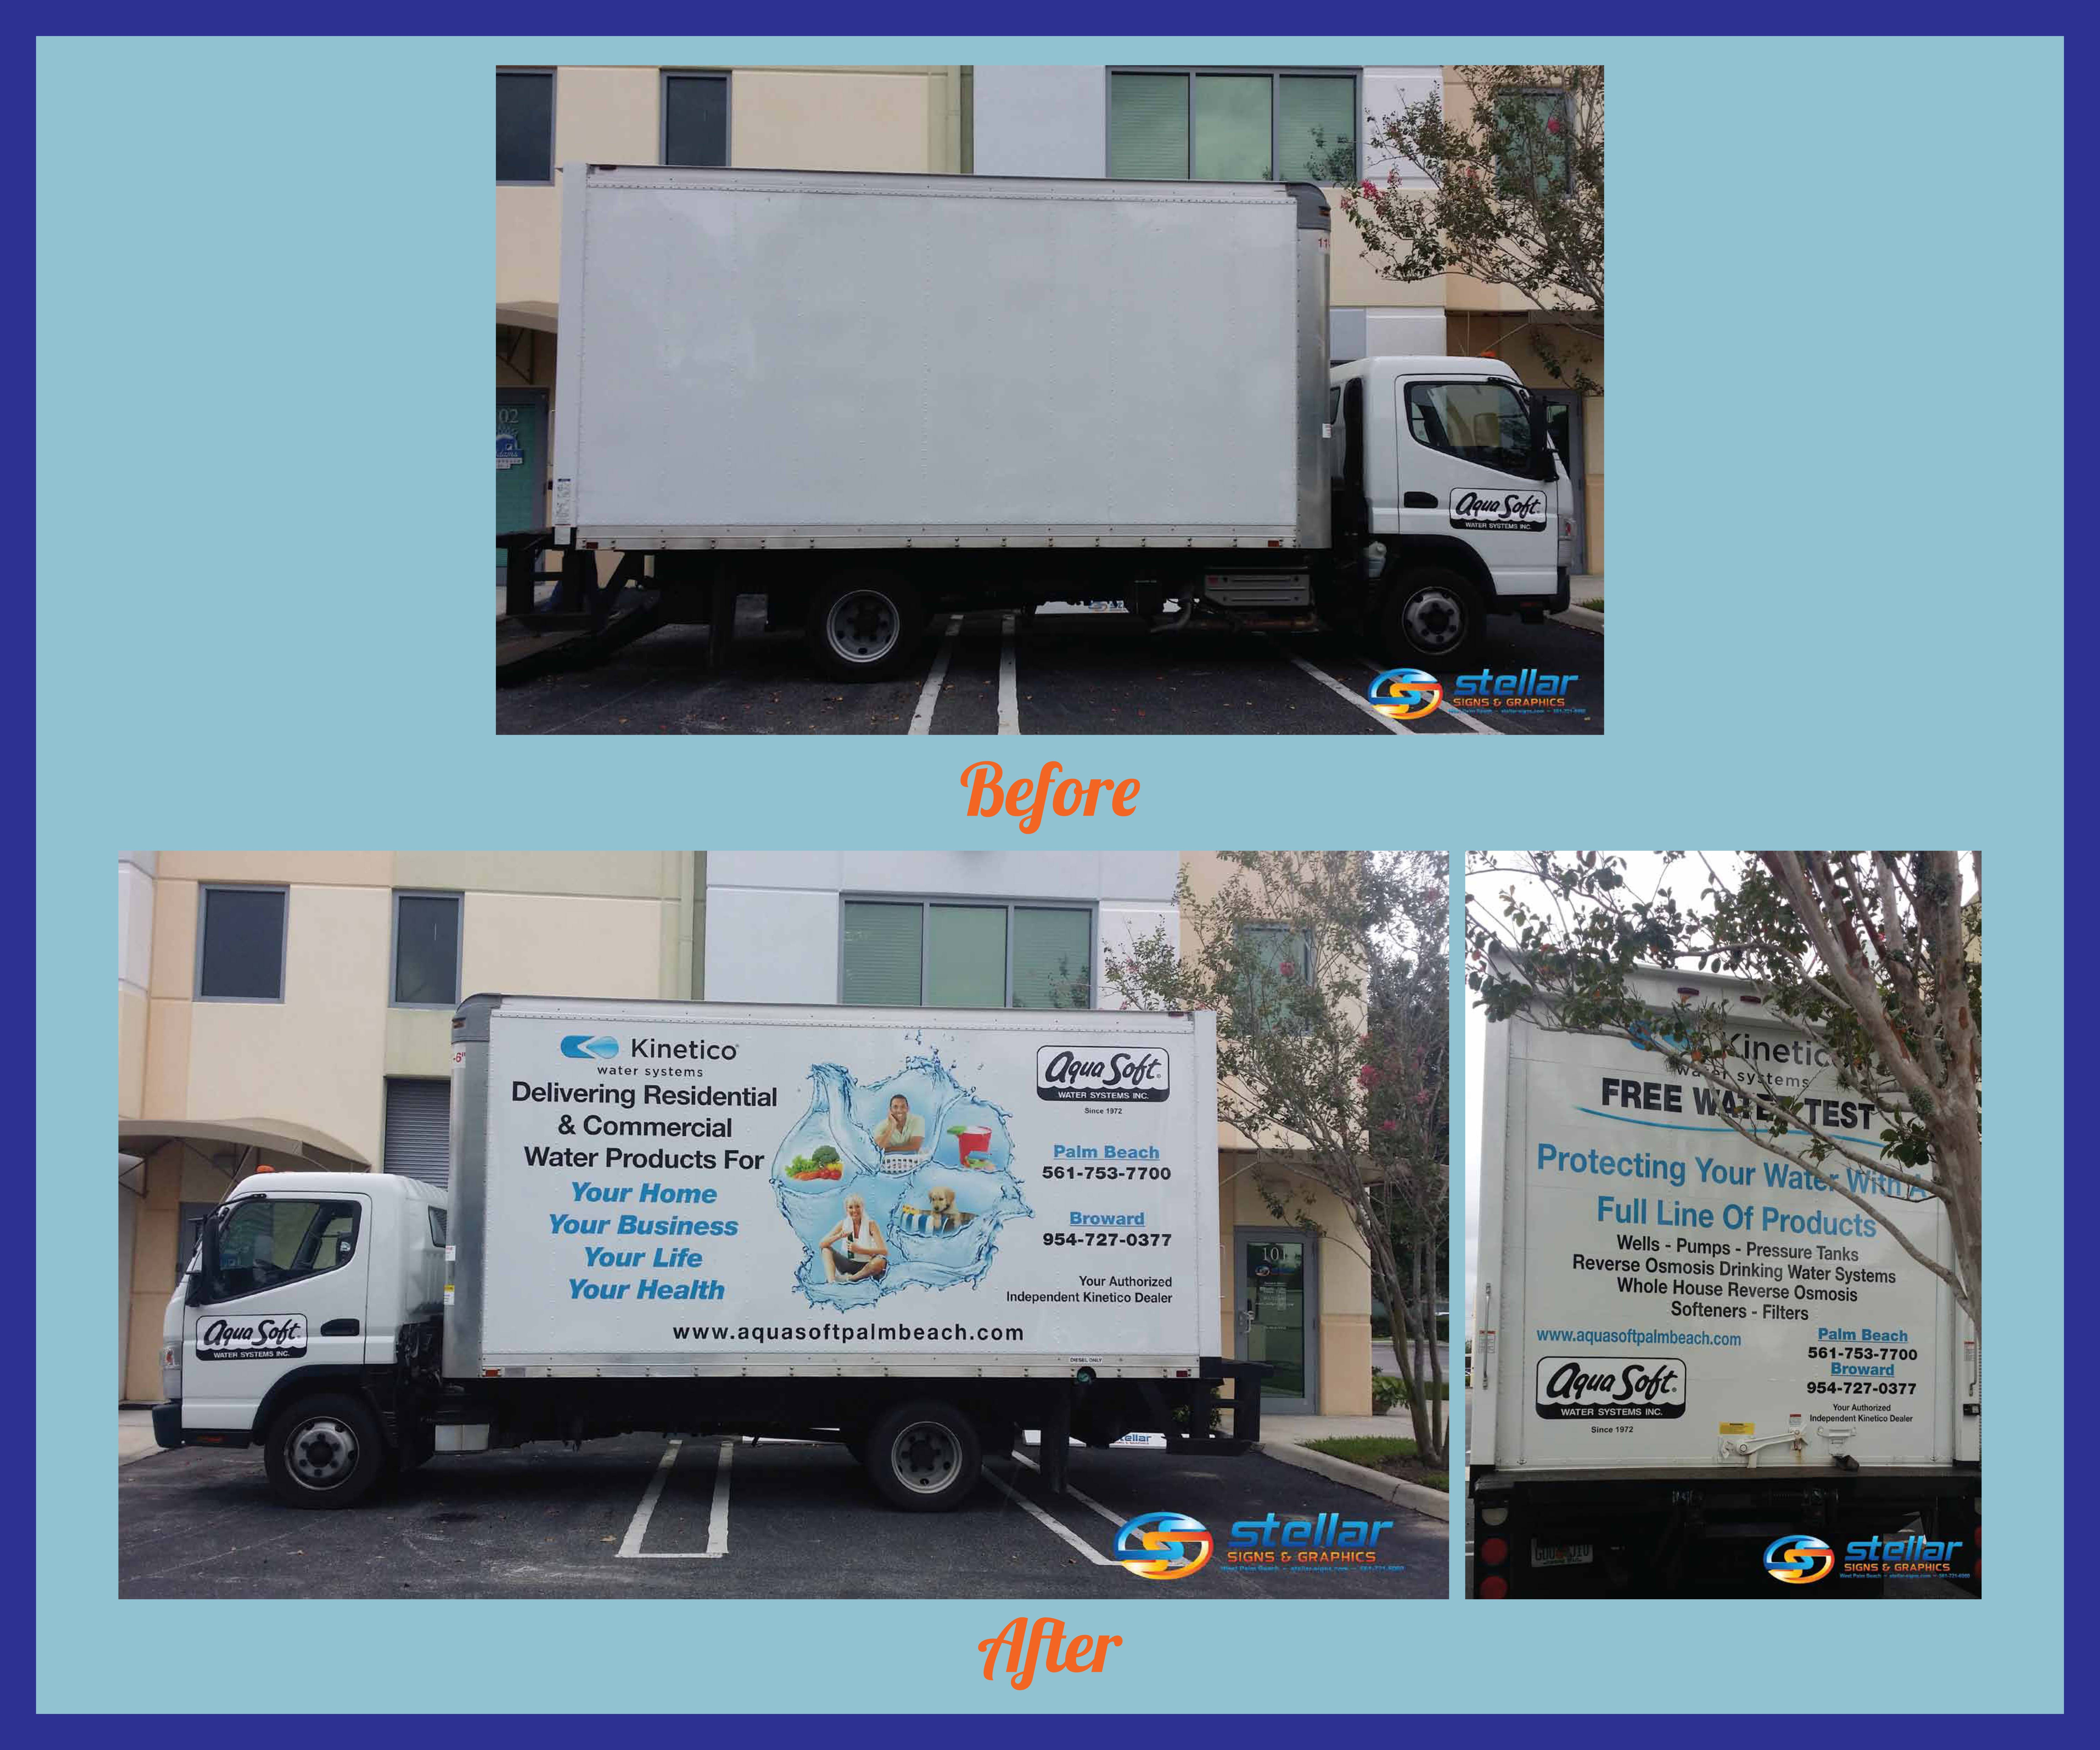 Take a look at Aqua Soft's Mitsubishi FUSO Box Truck